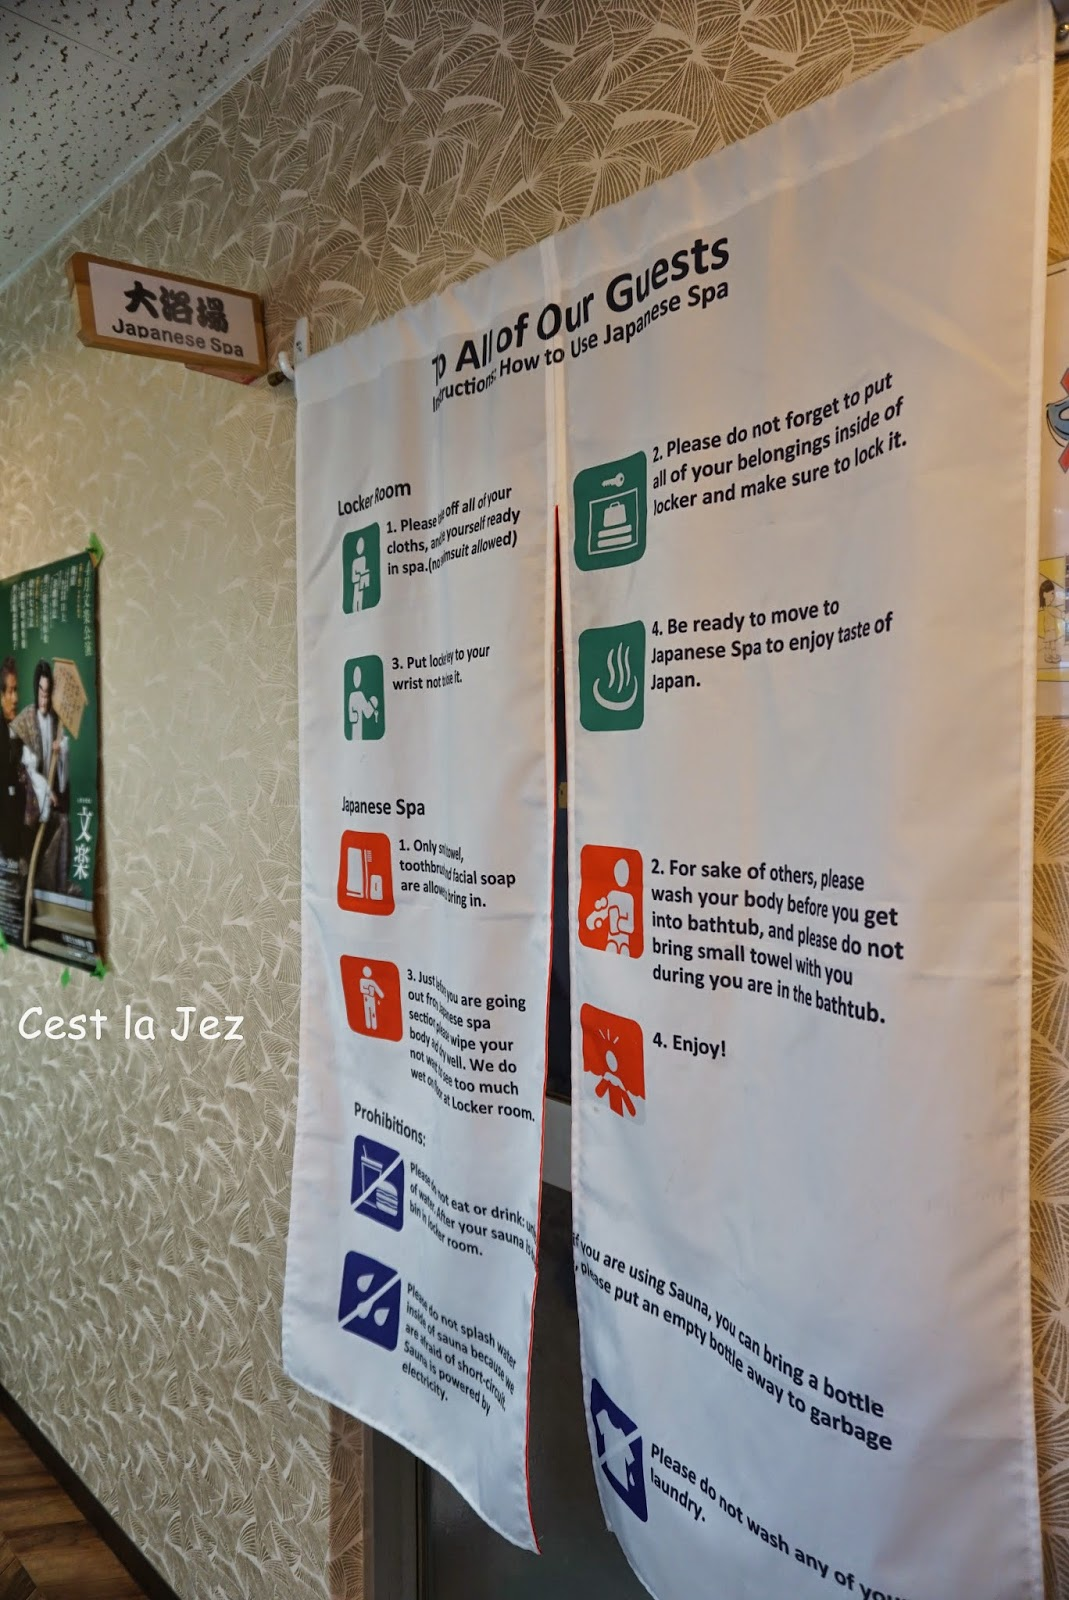 japan osaka kyoto trip Hotel Mikado malaysian travel blogger cestlajez